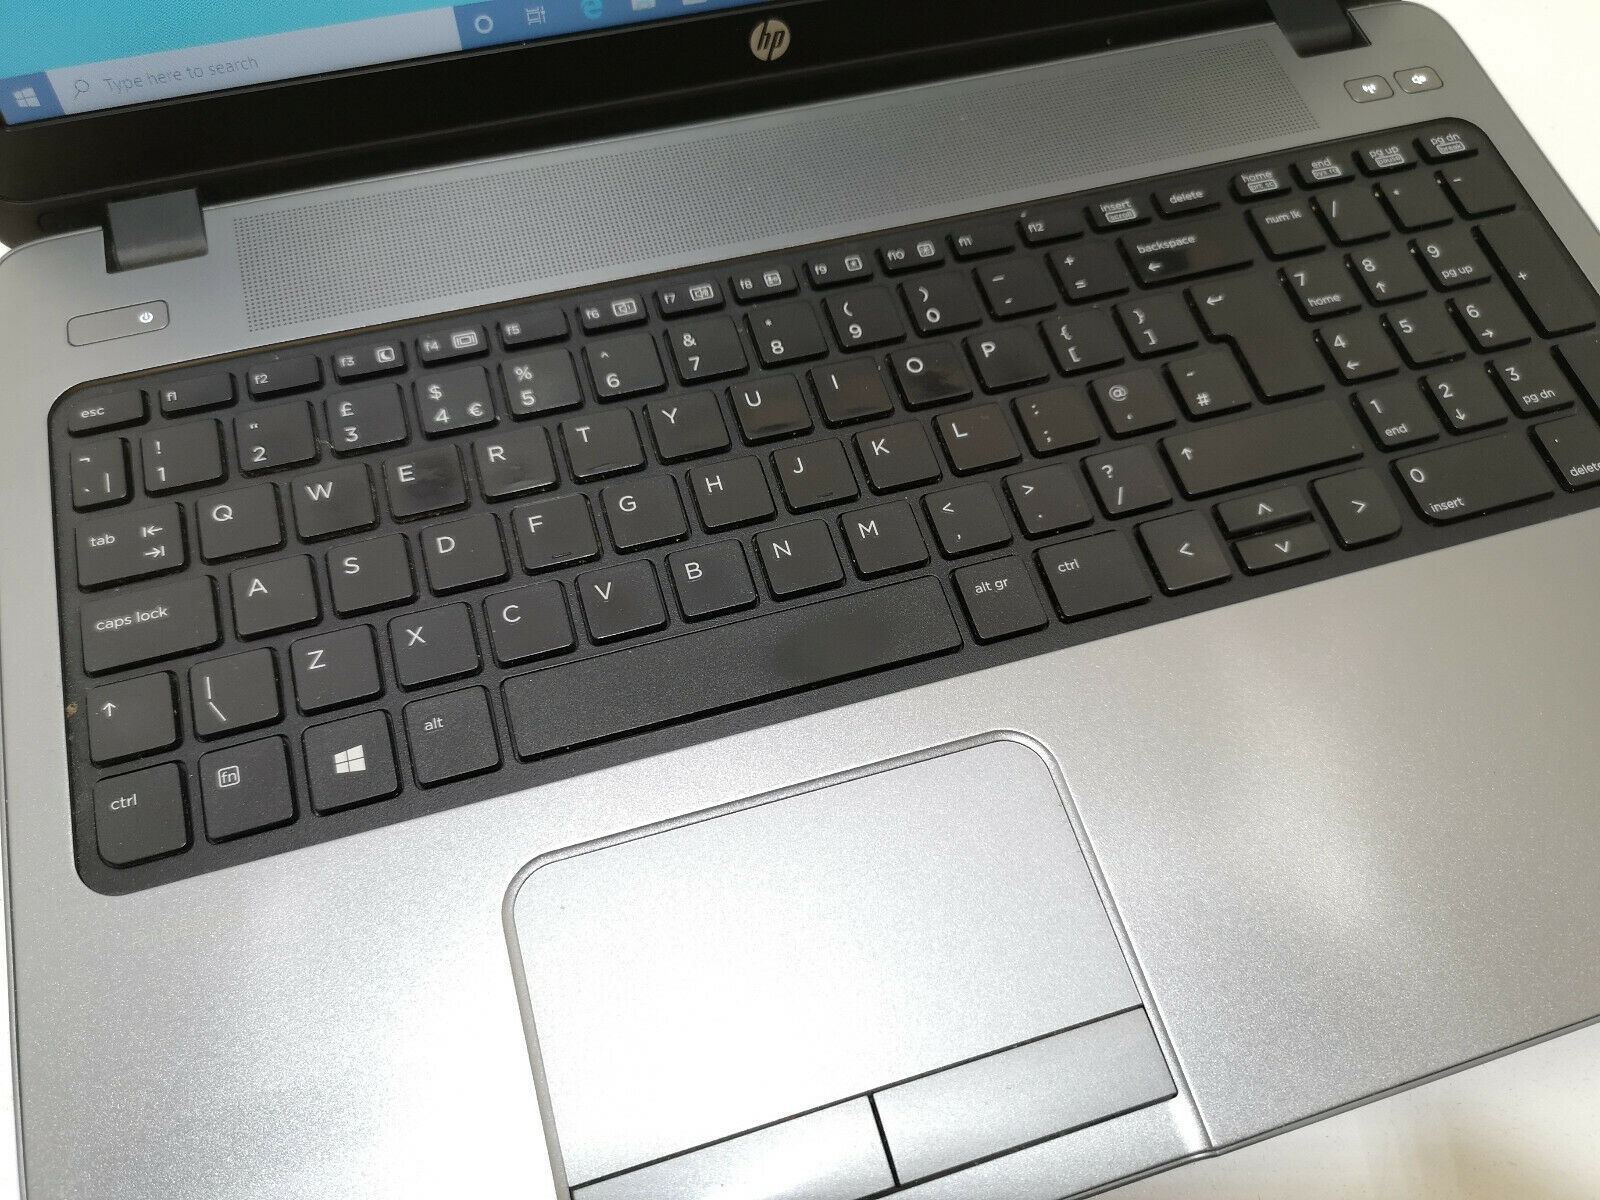 HP Probook 455 G1 No 2